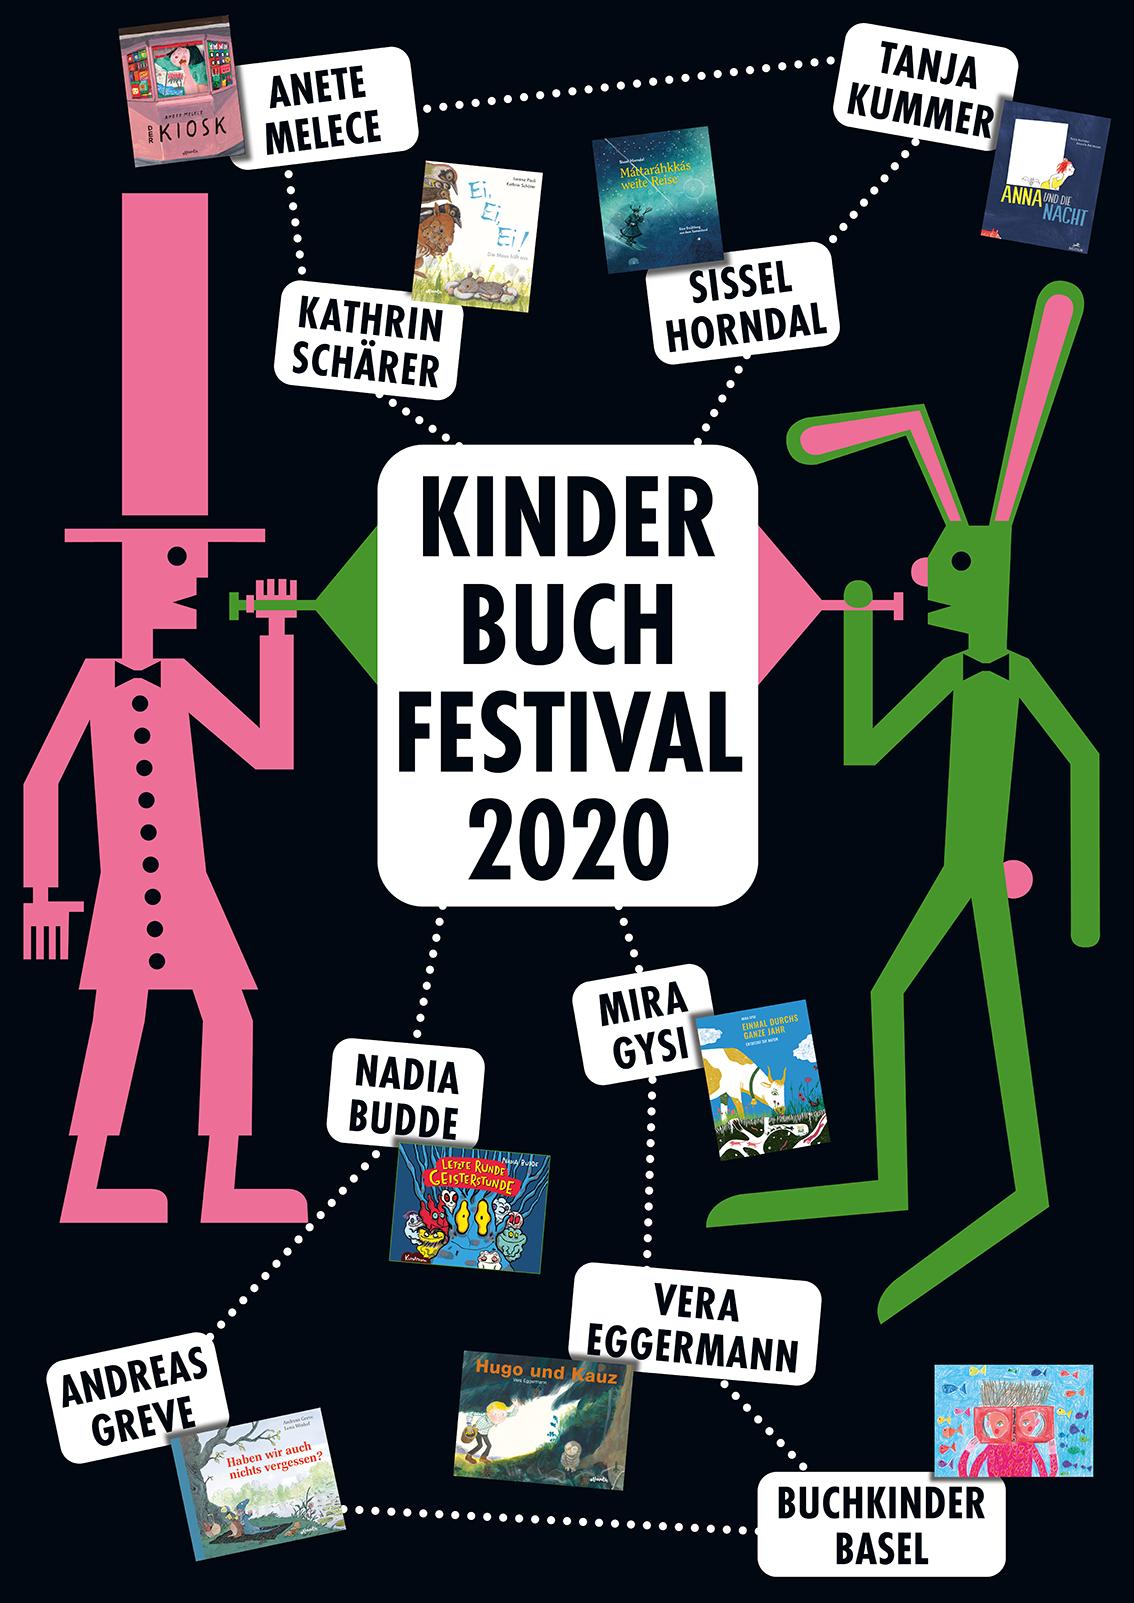 Kinderbuchfestival 2020